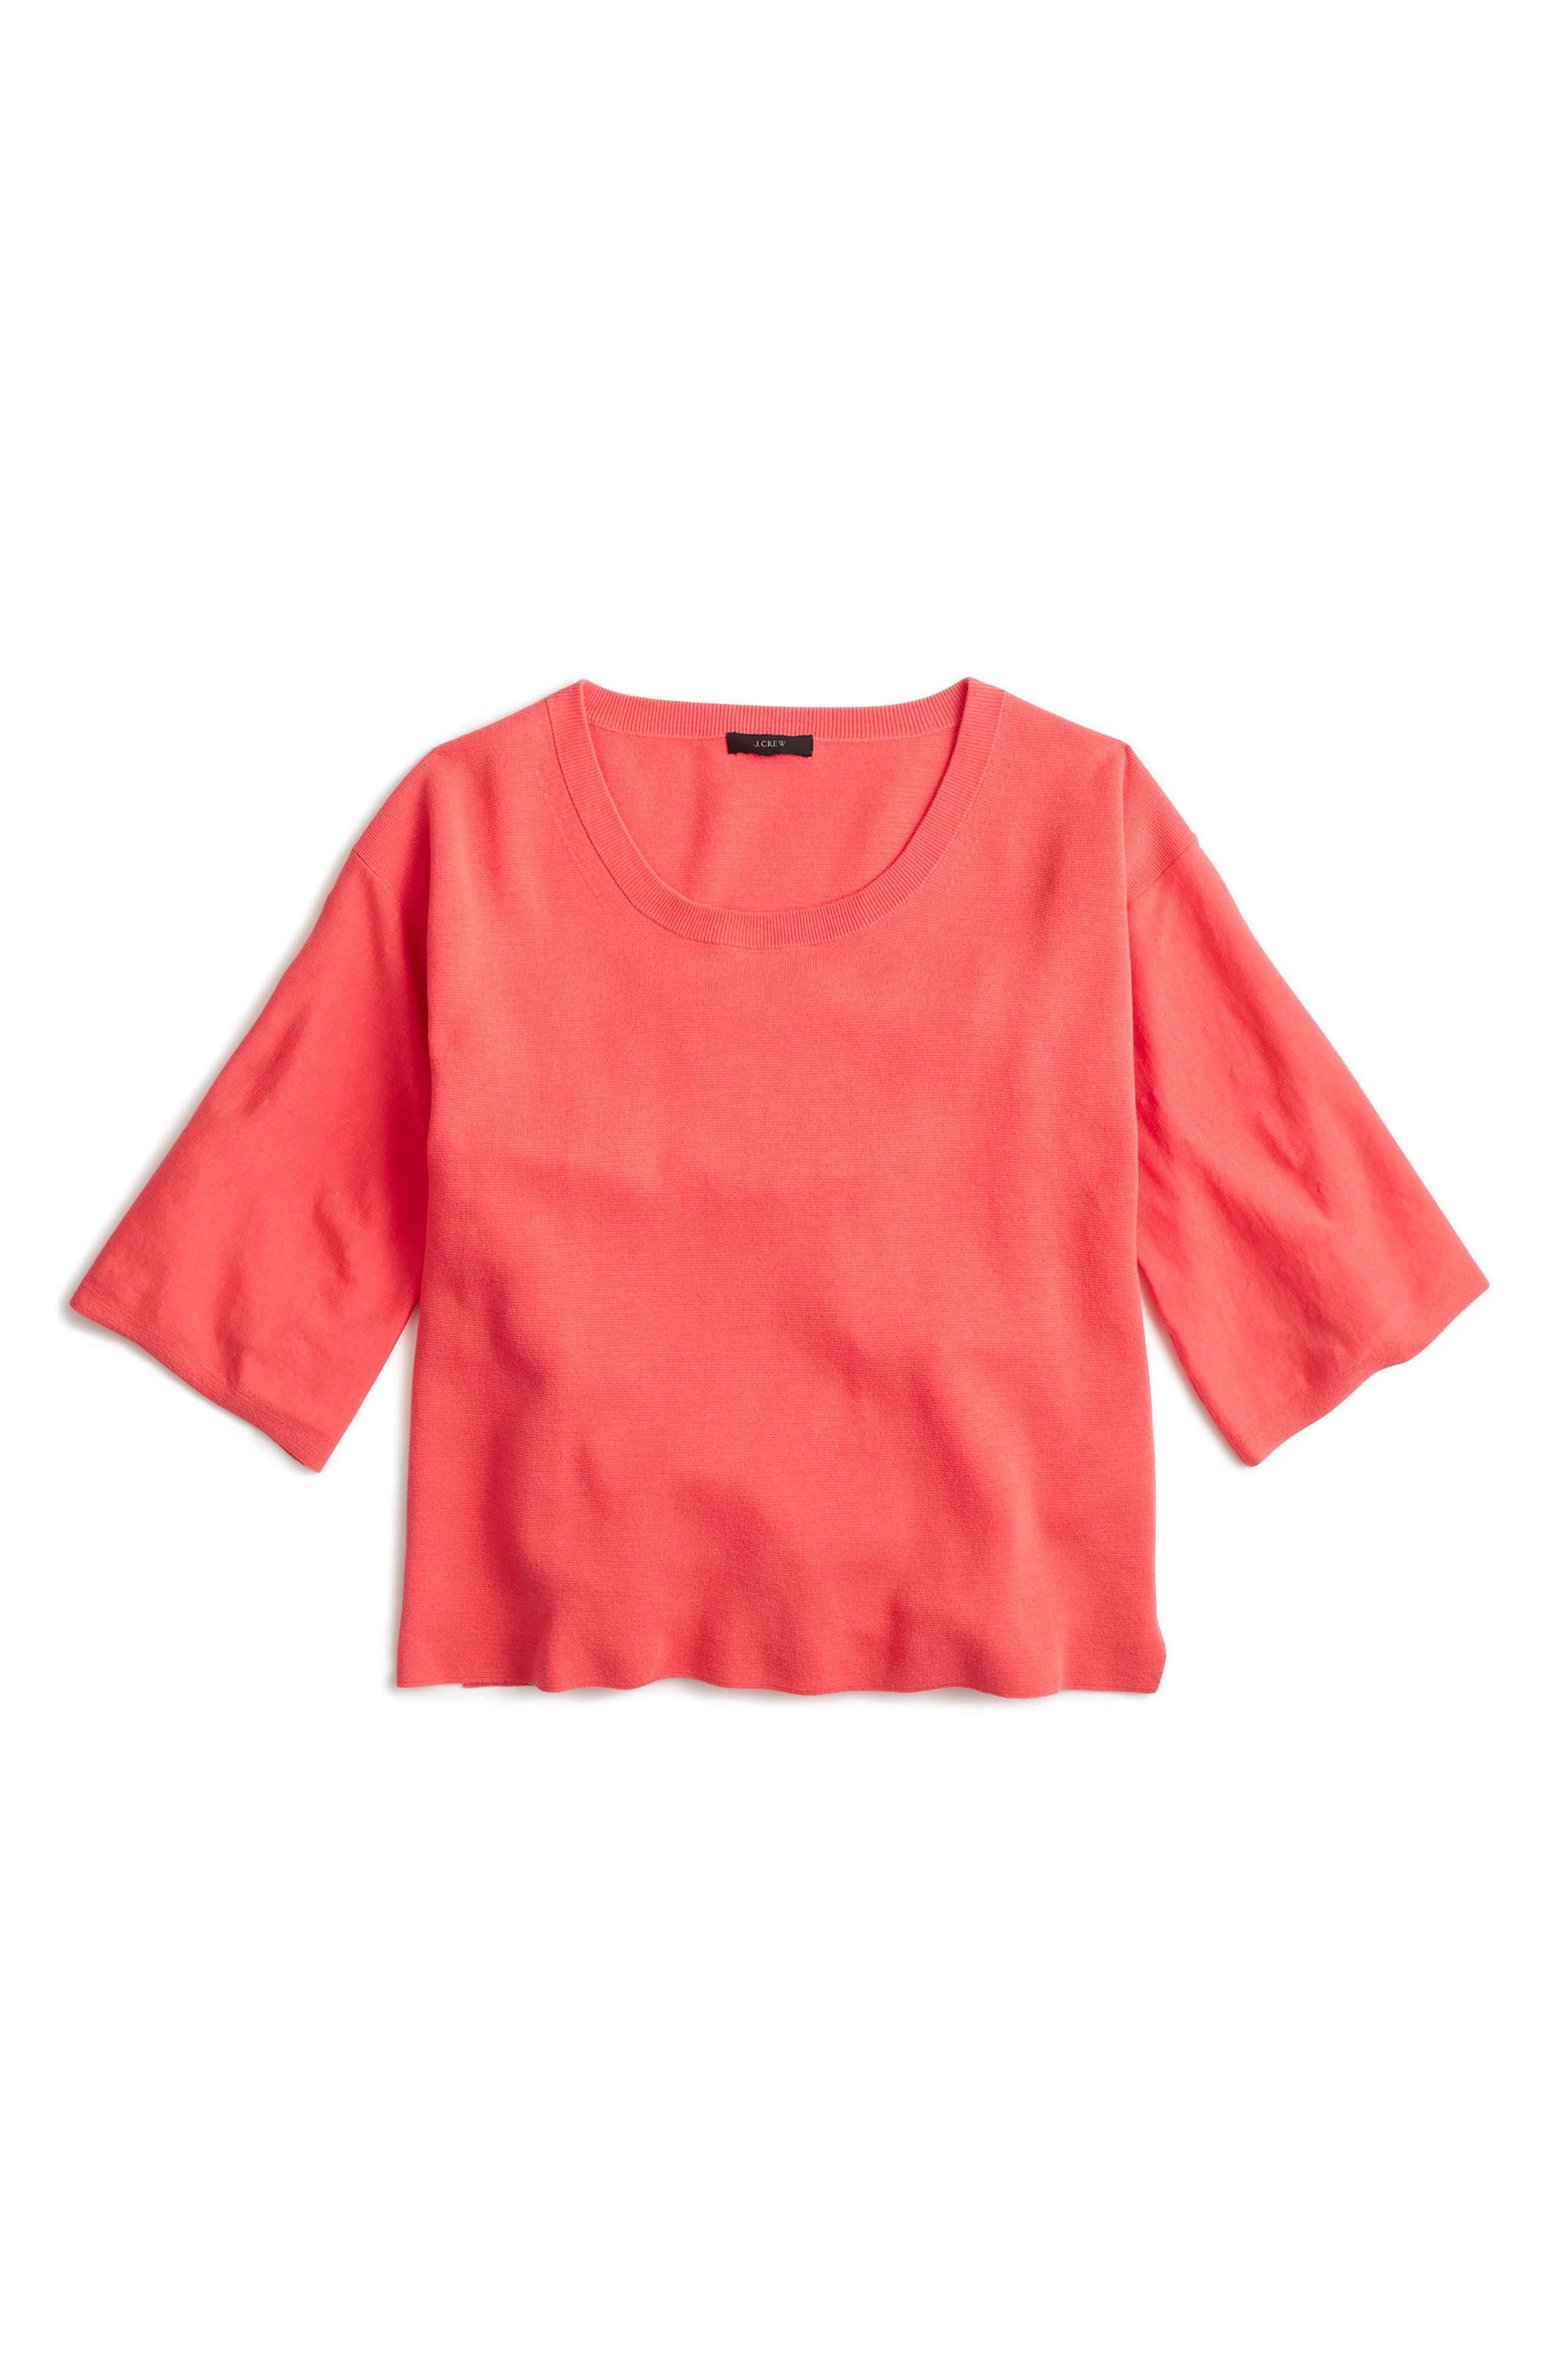 J.Crew Dramatic Sleeve Summerweight Cotton Sweater